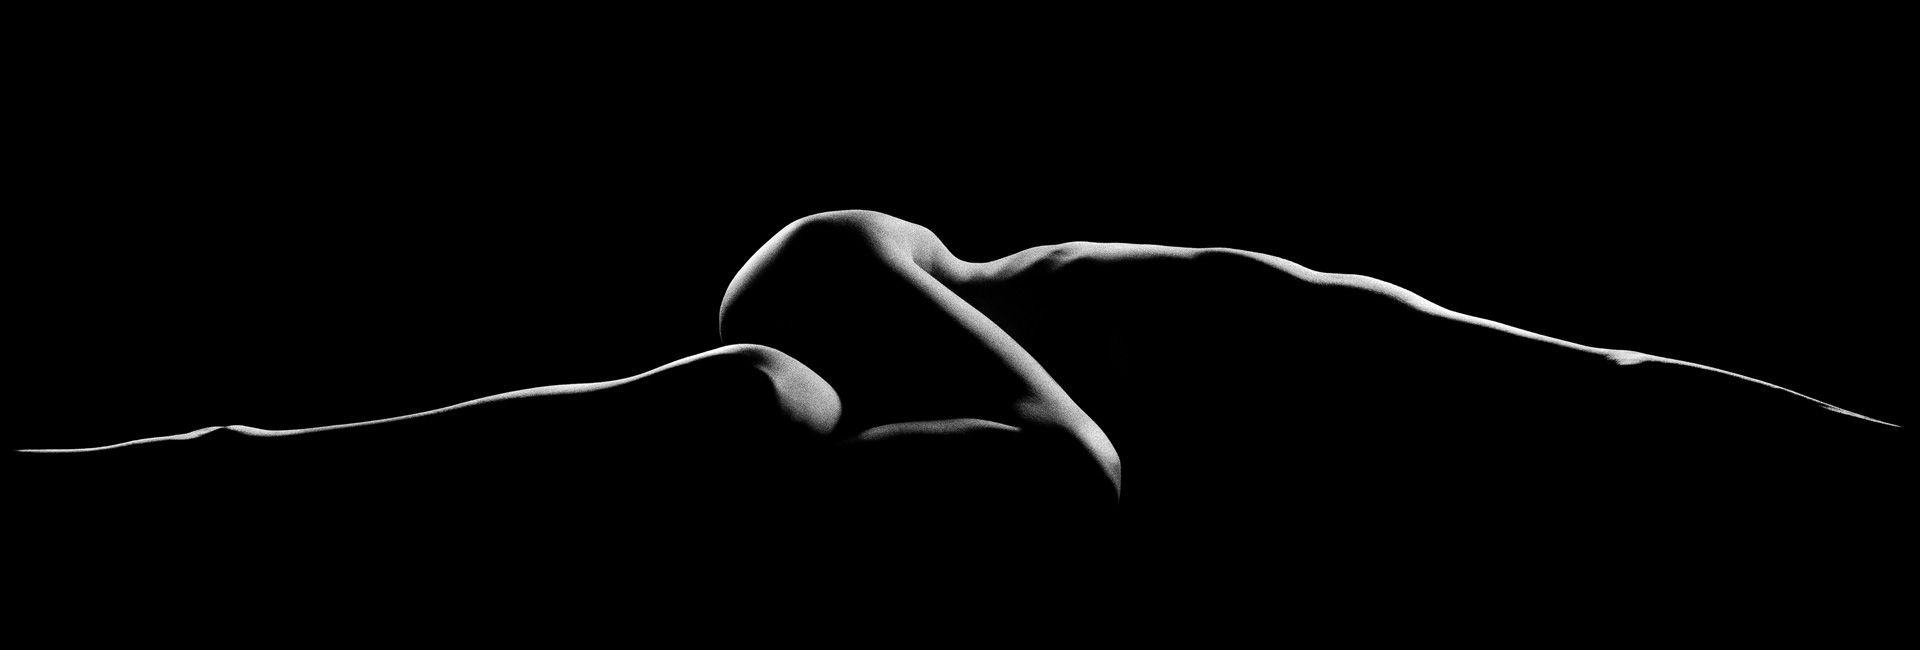 Simon Chaput - Panoramic Nude ; Andrea NY 1L